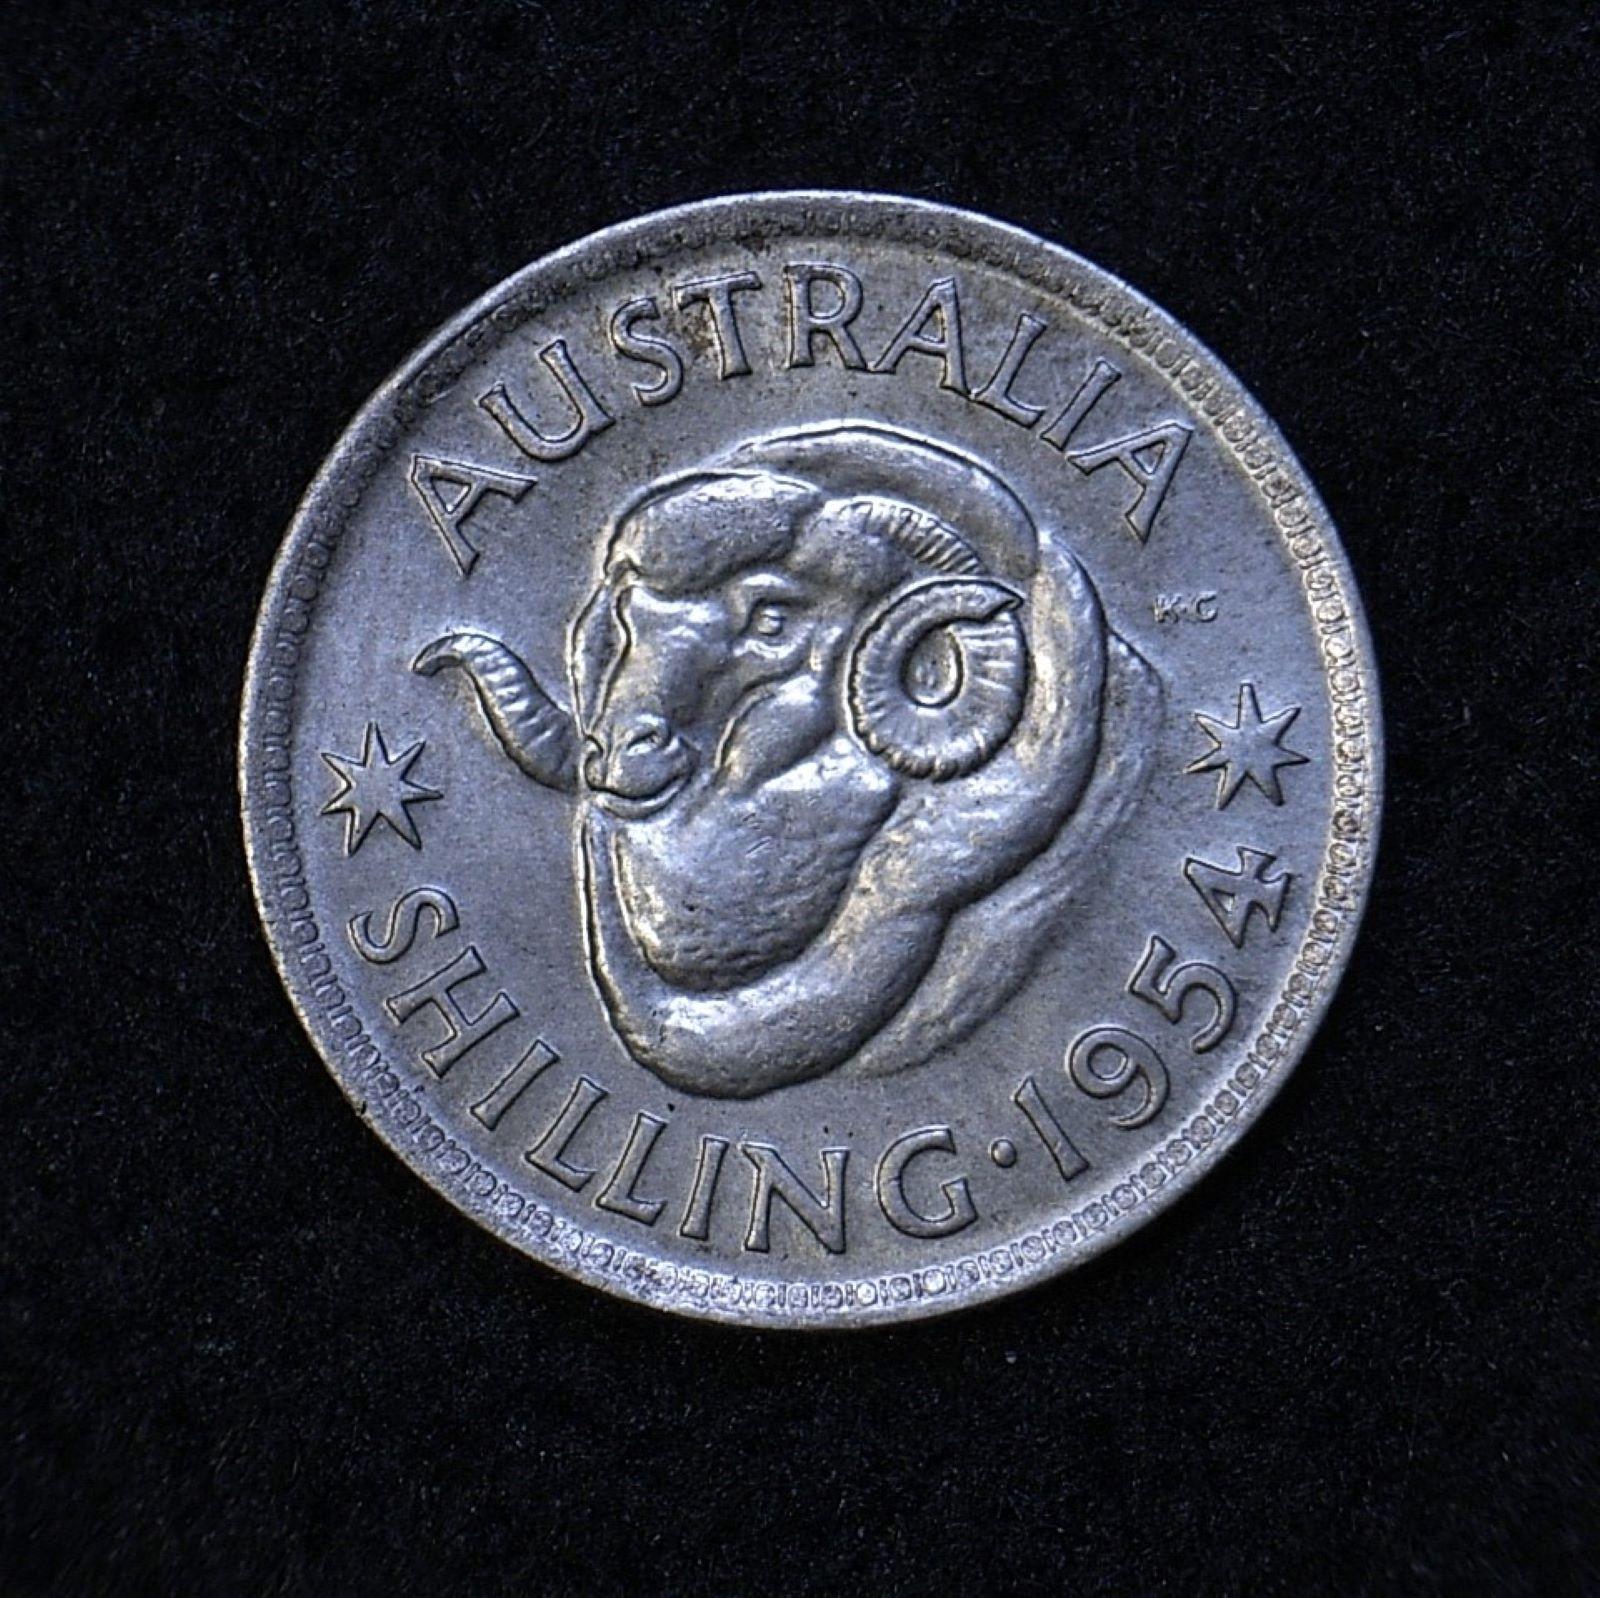 Aus Shilling 1954 rev